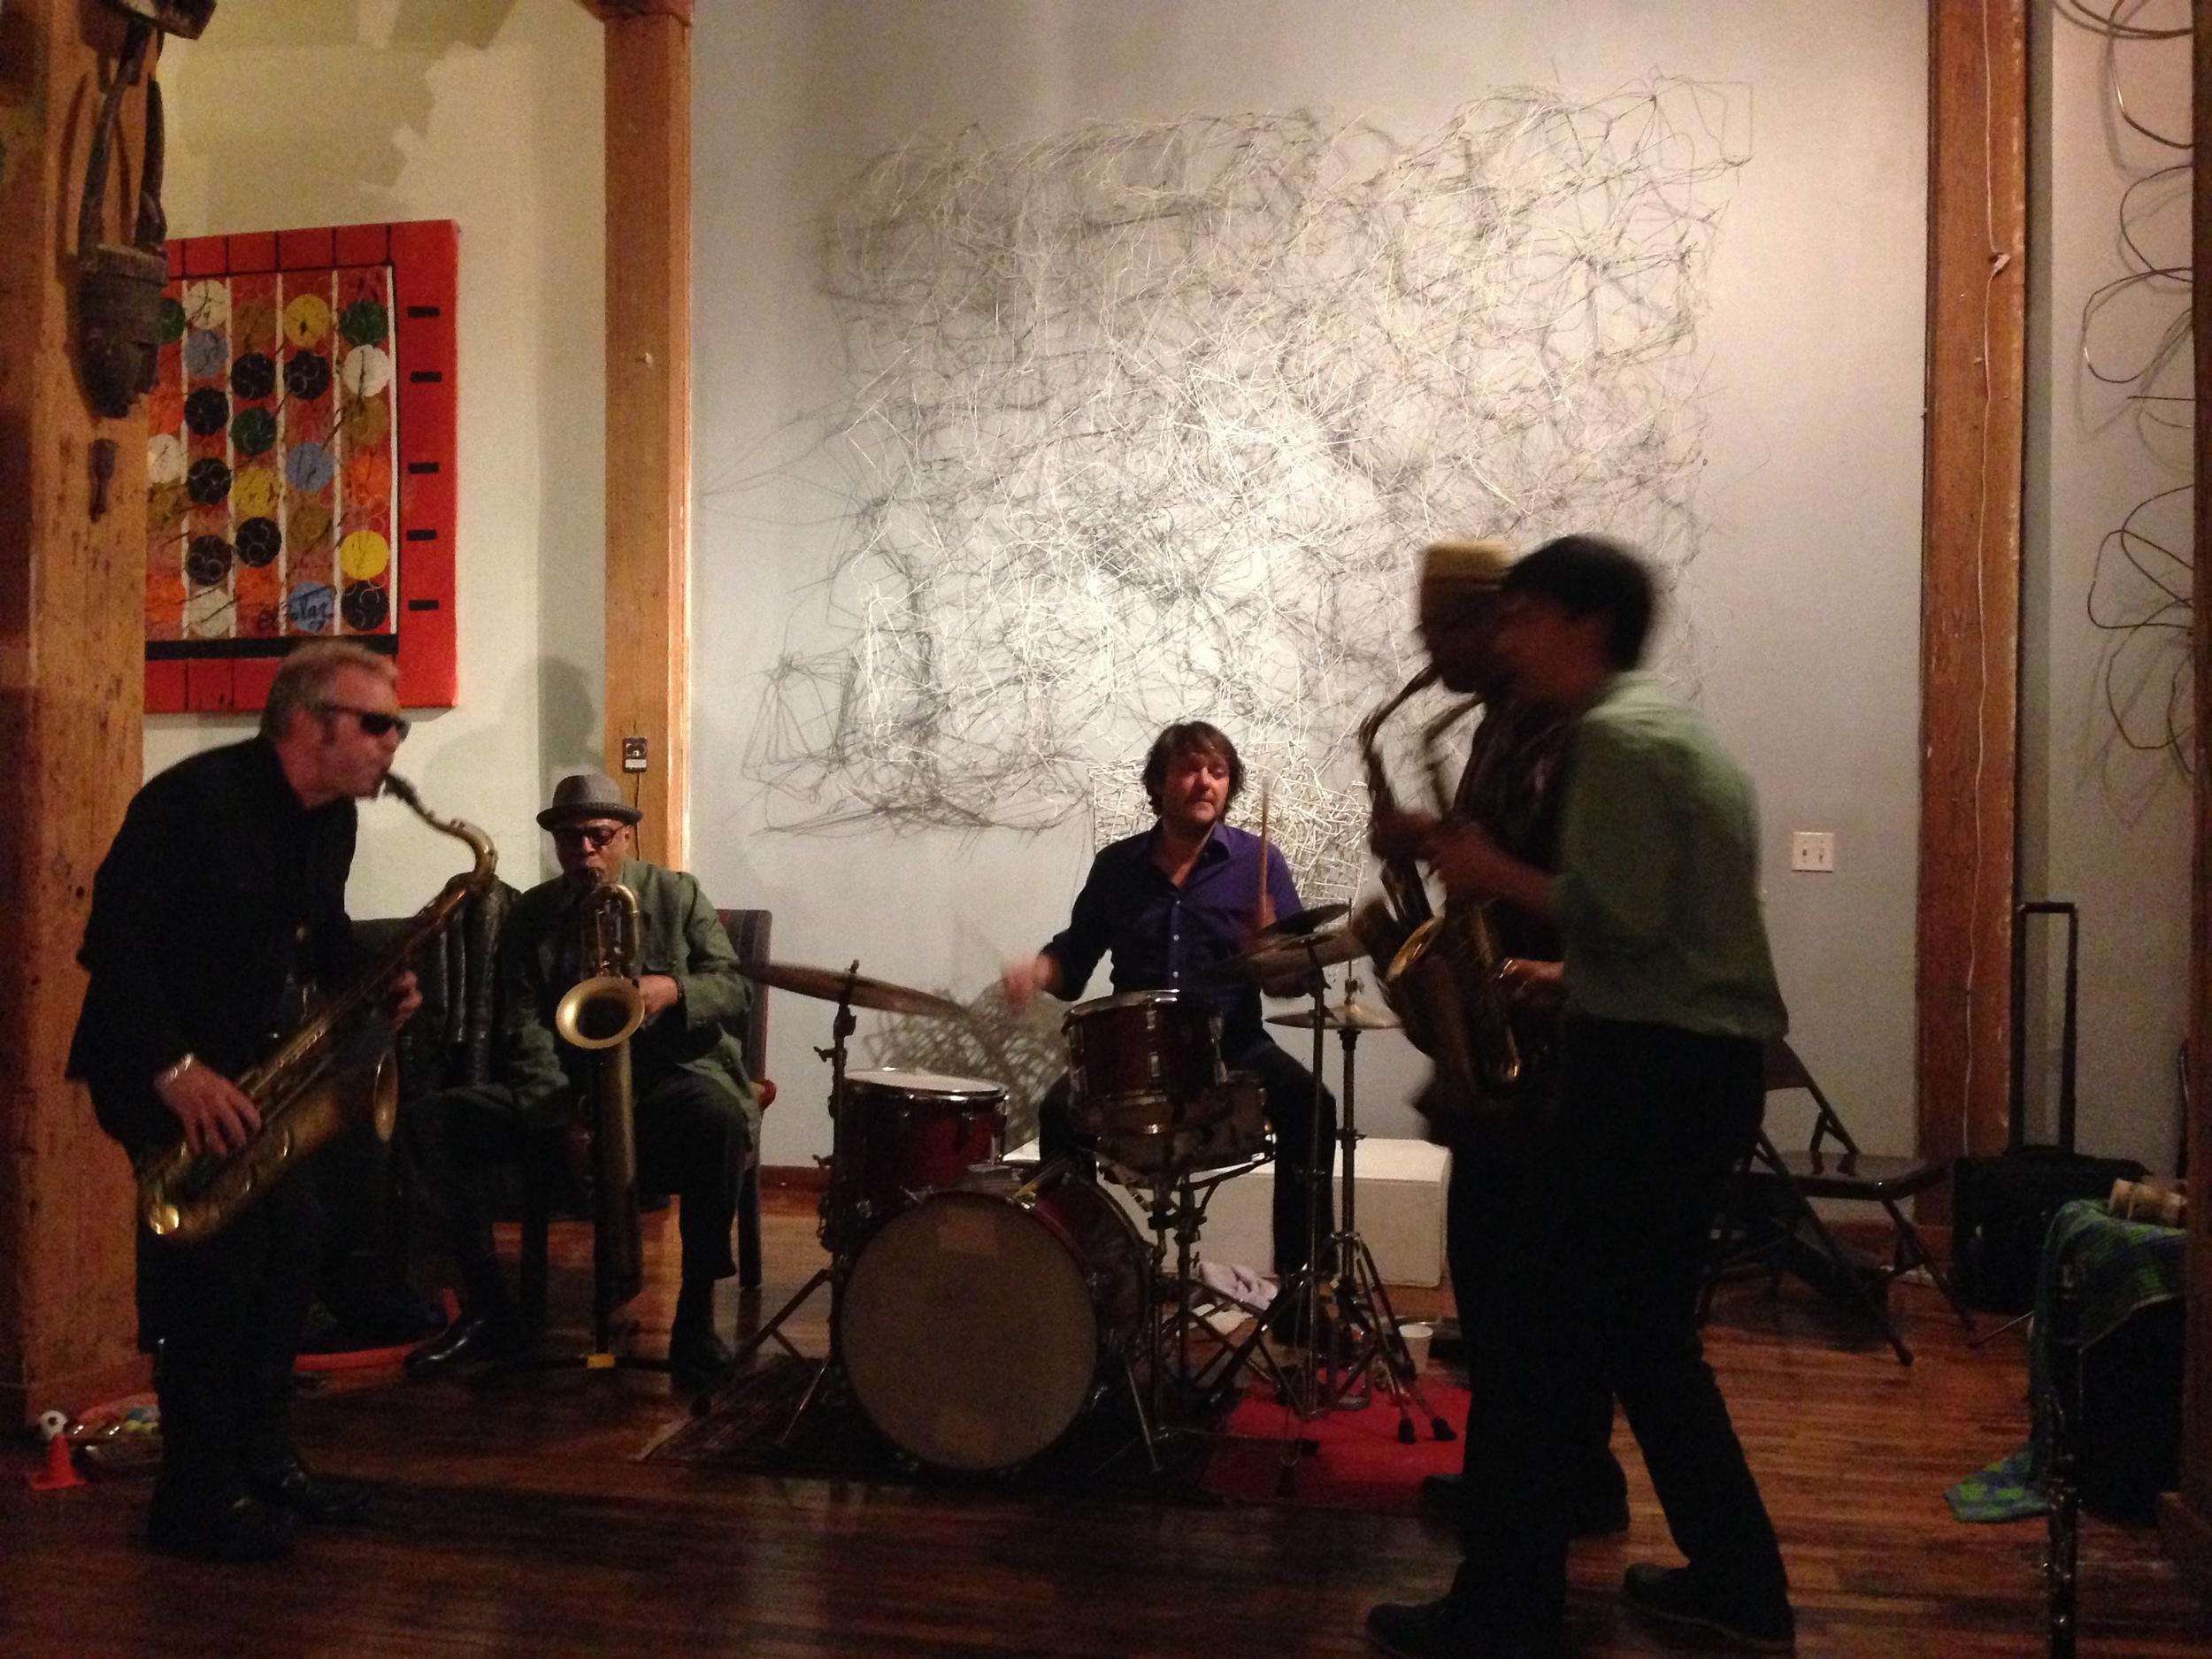 Mars Williams, Hammiet Bluette, Ernest Khabeer Dawkins & Antonin-tri Hoang (saxophones, clarinets), Samuel Silvant (drums)